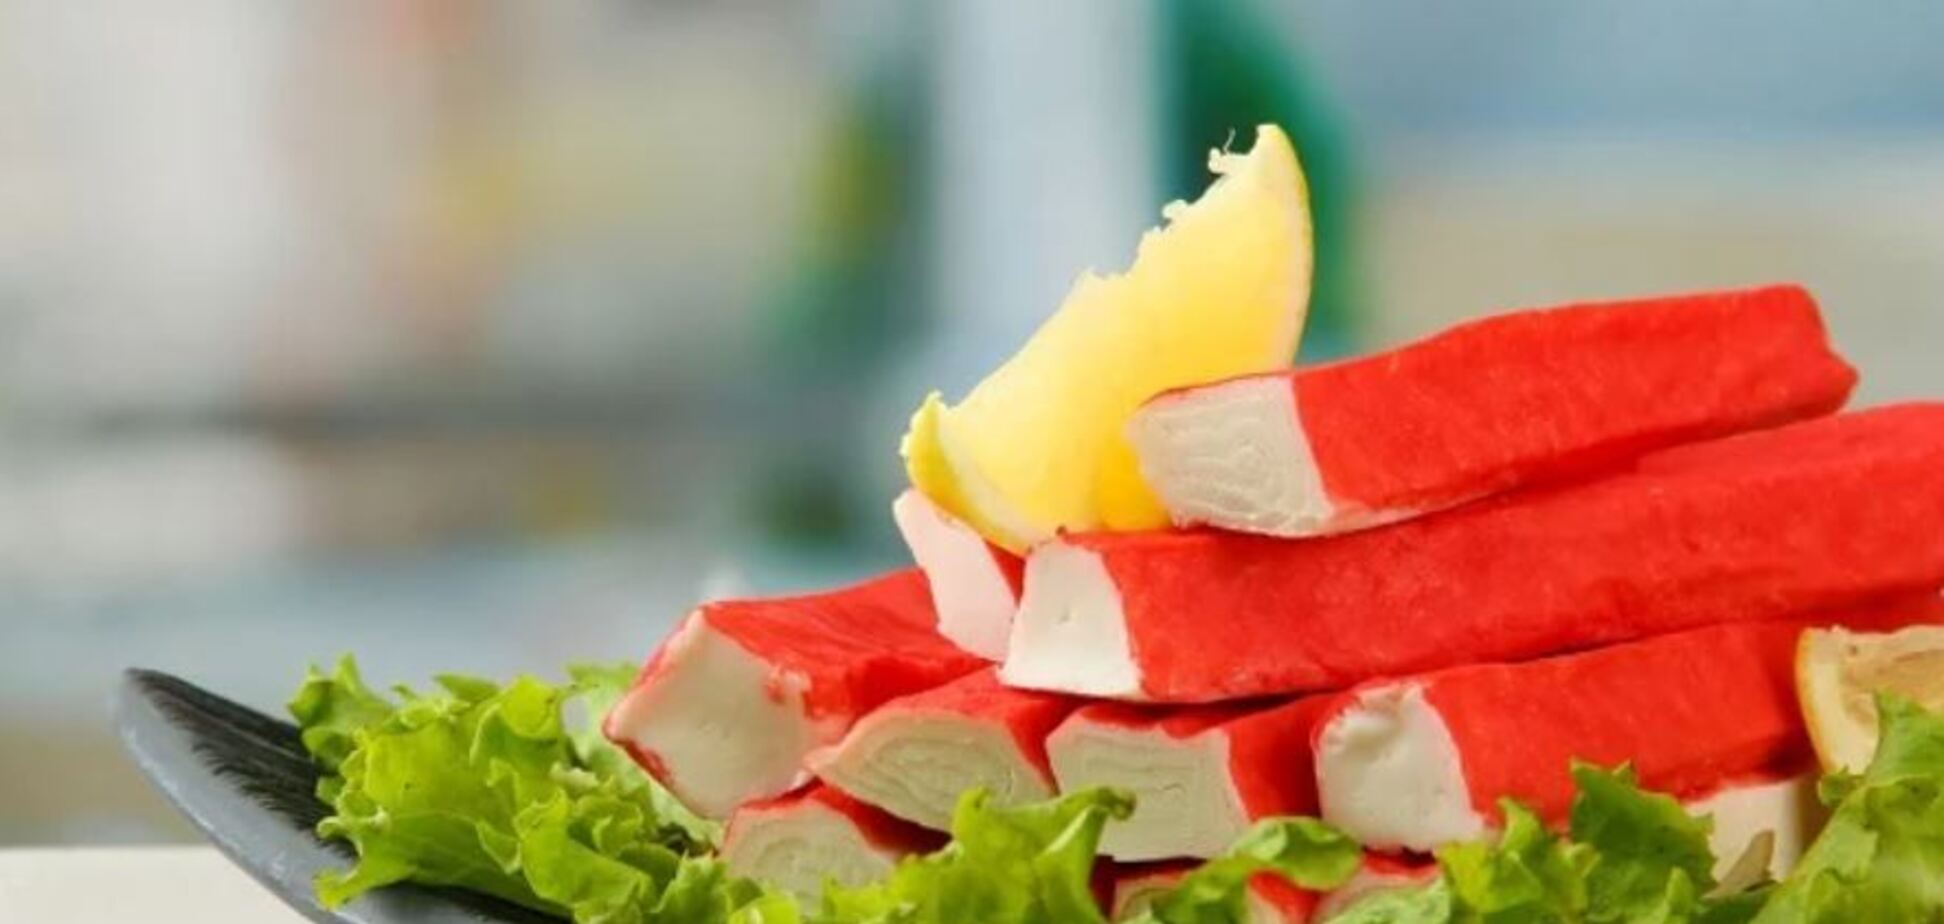 Рецепт неймовірно смачного салату з крабовими паличками без майонезу